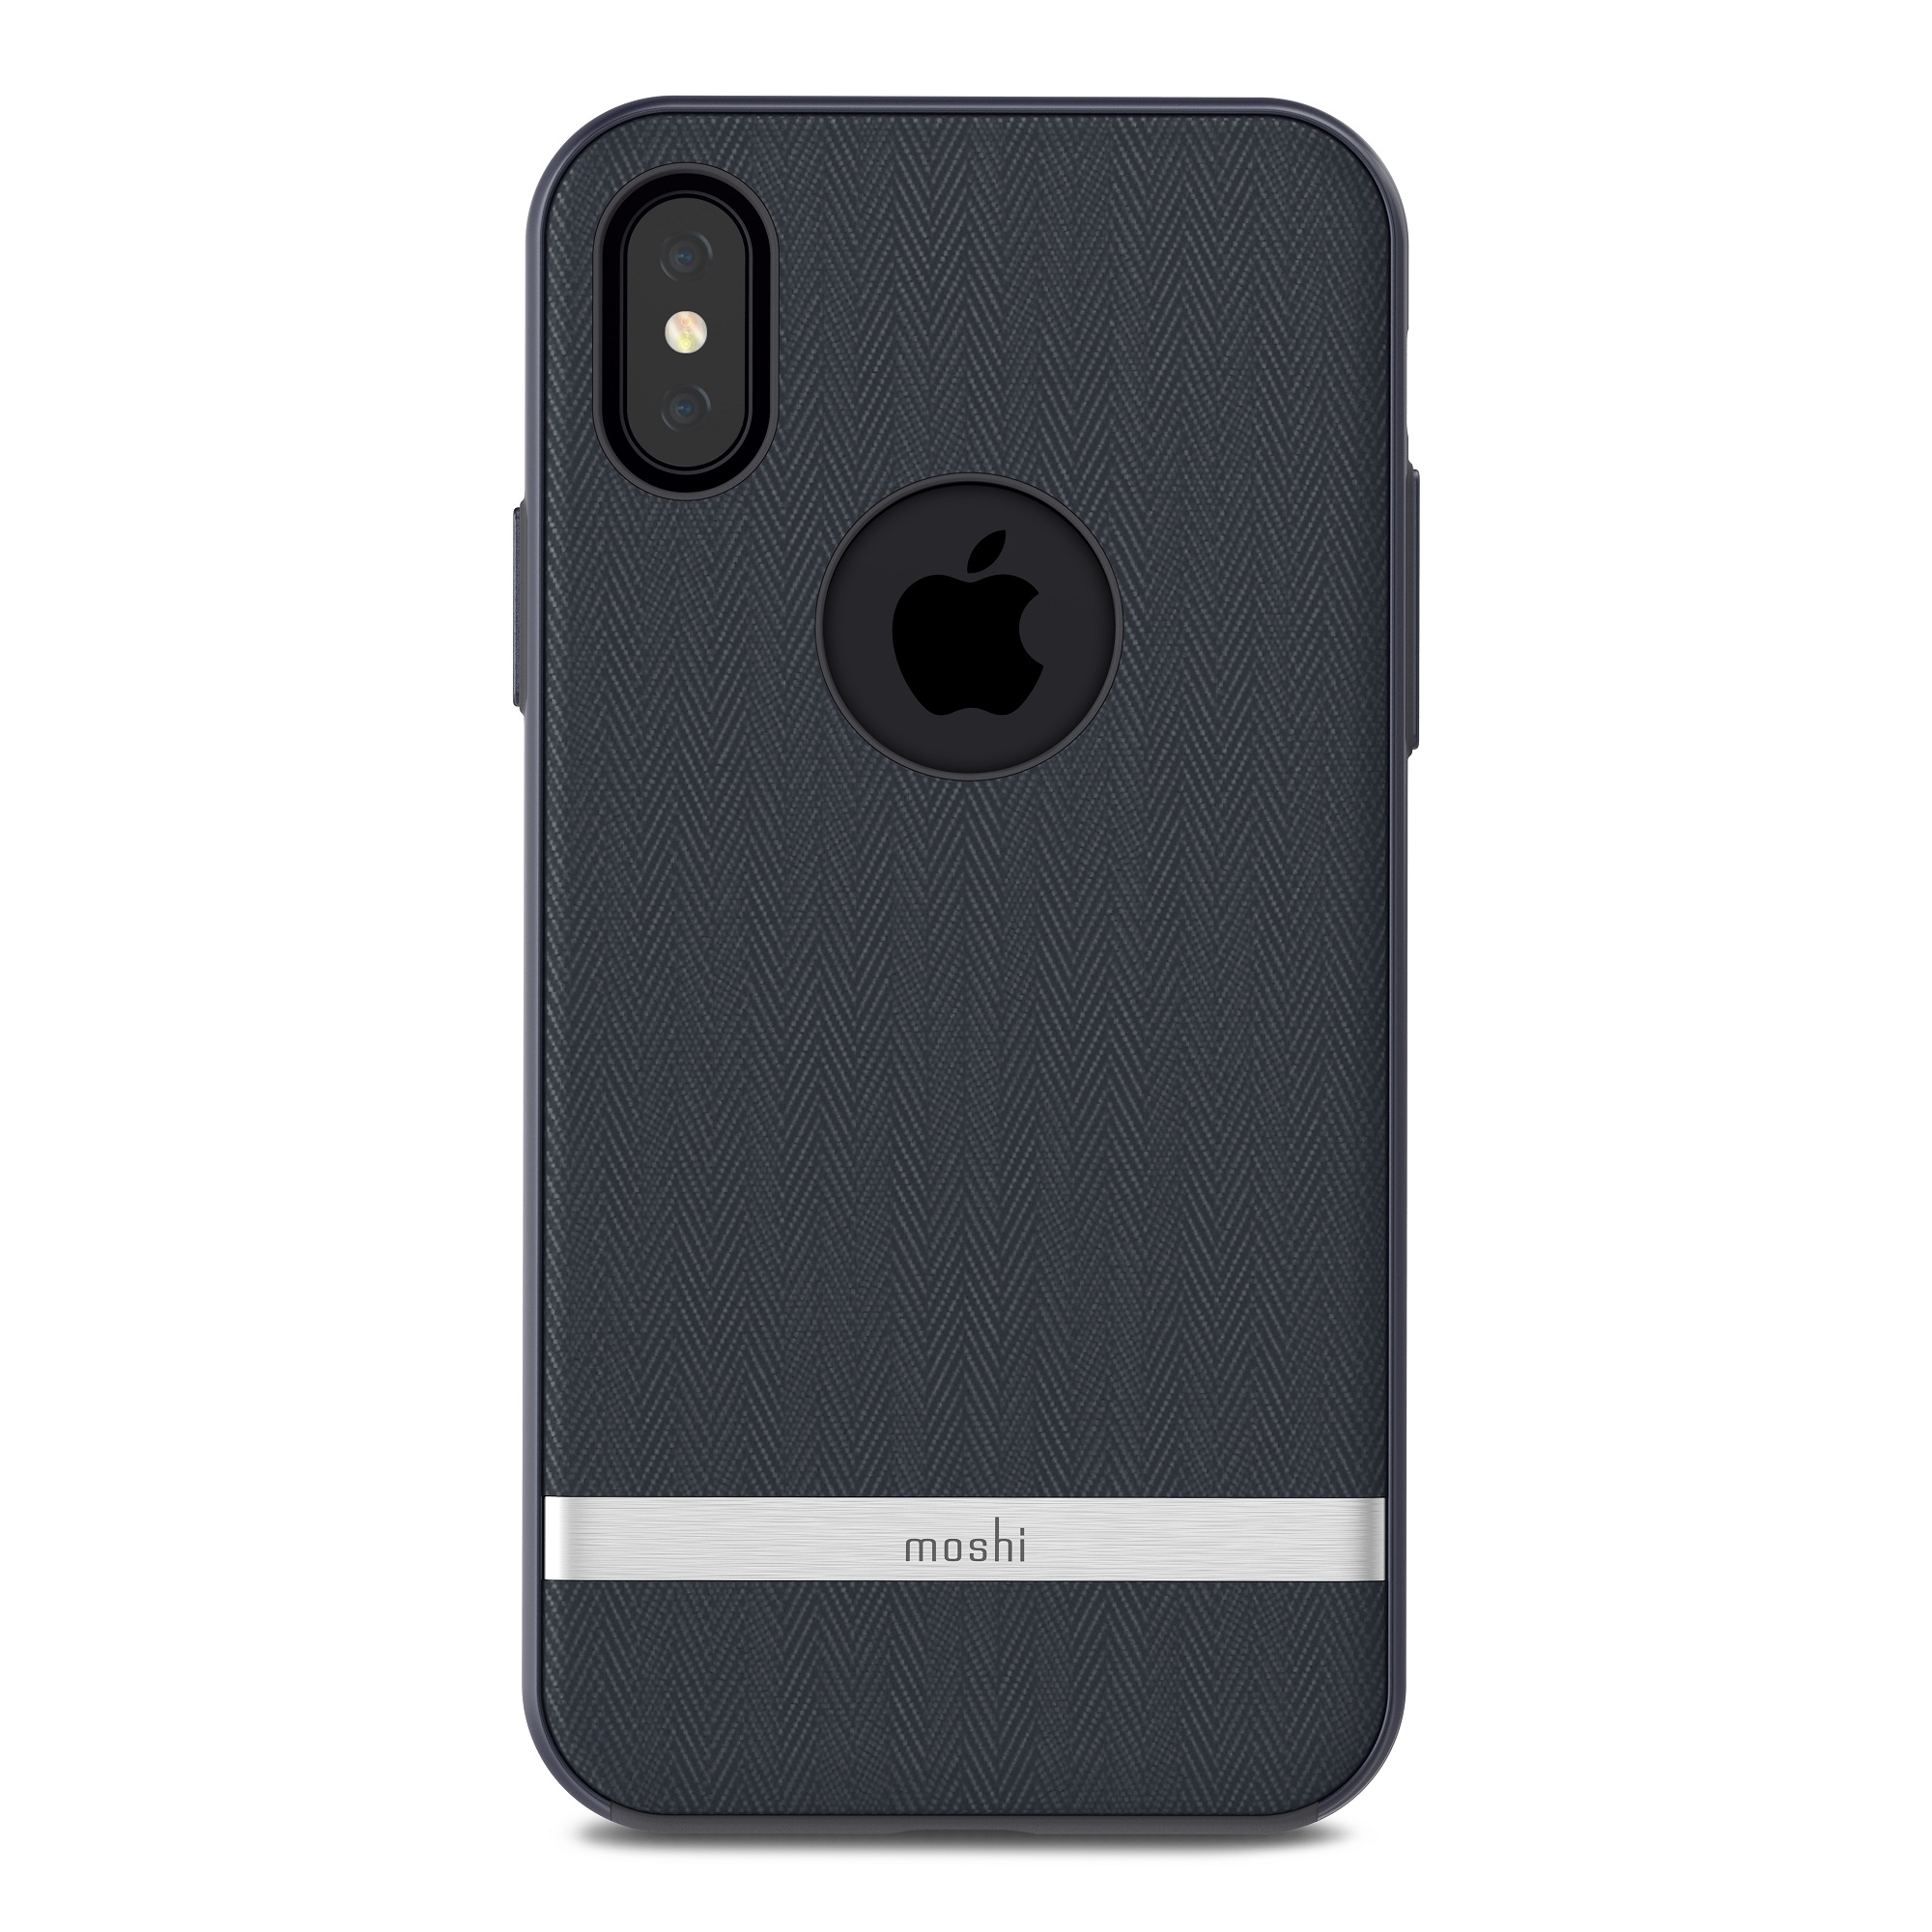 Moshi Vesta Case for iPhone XS/X